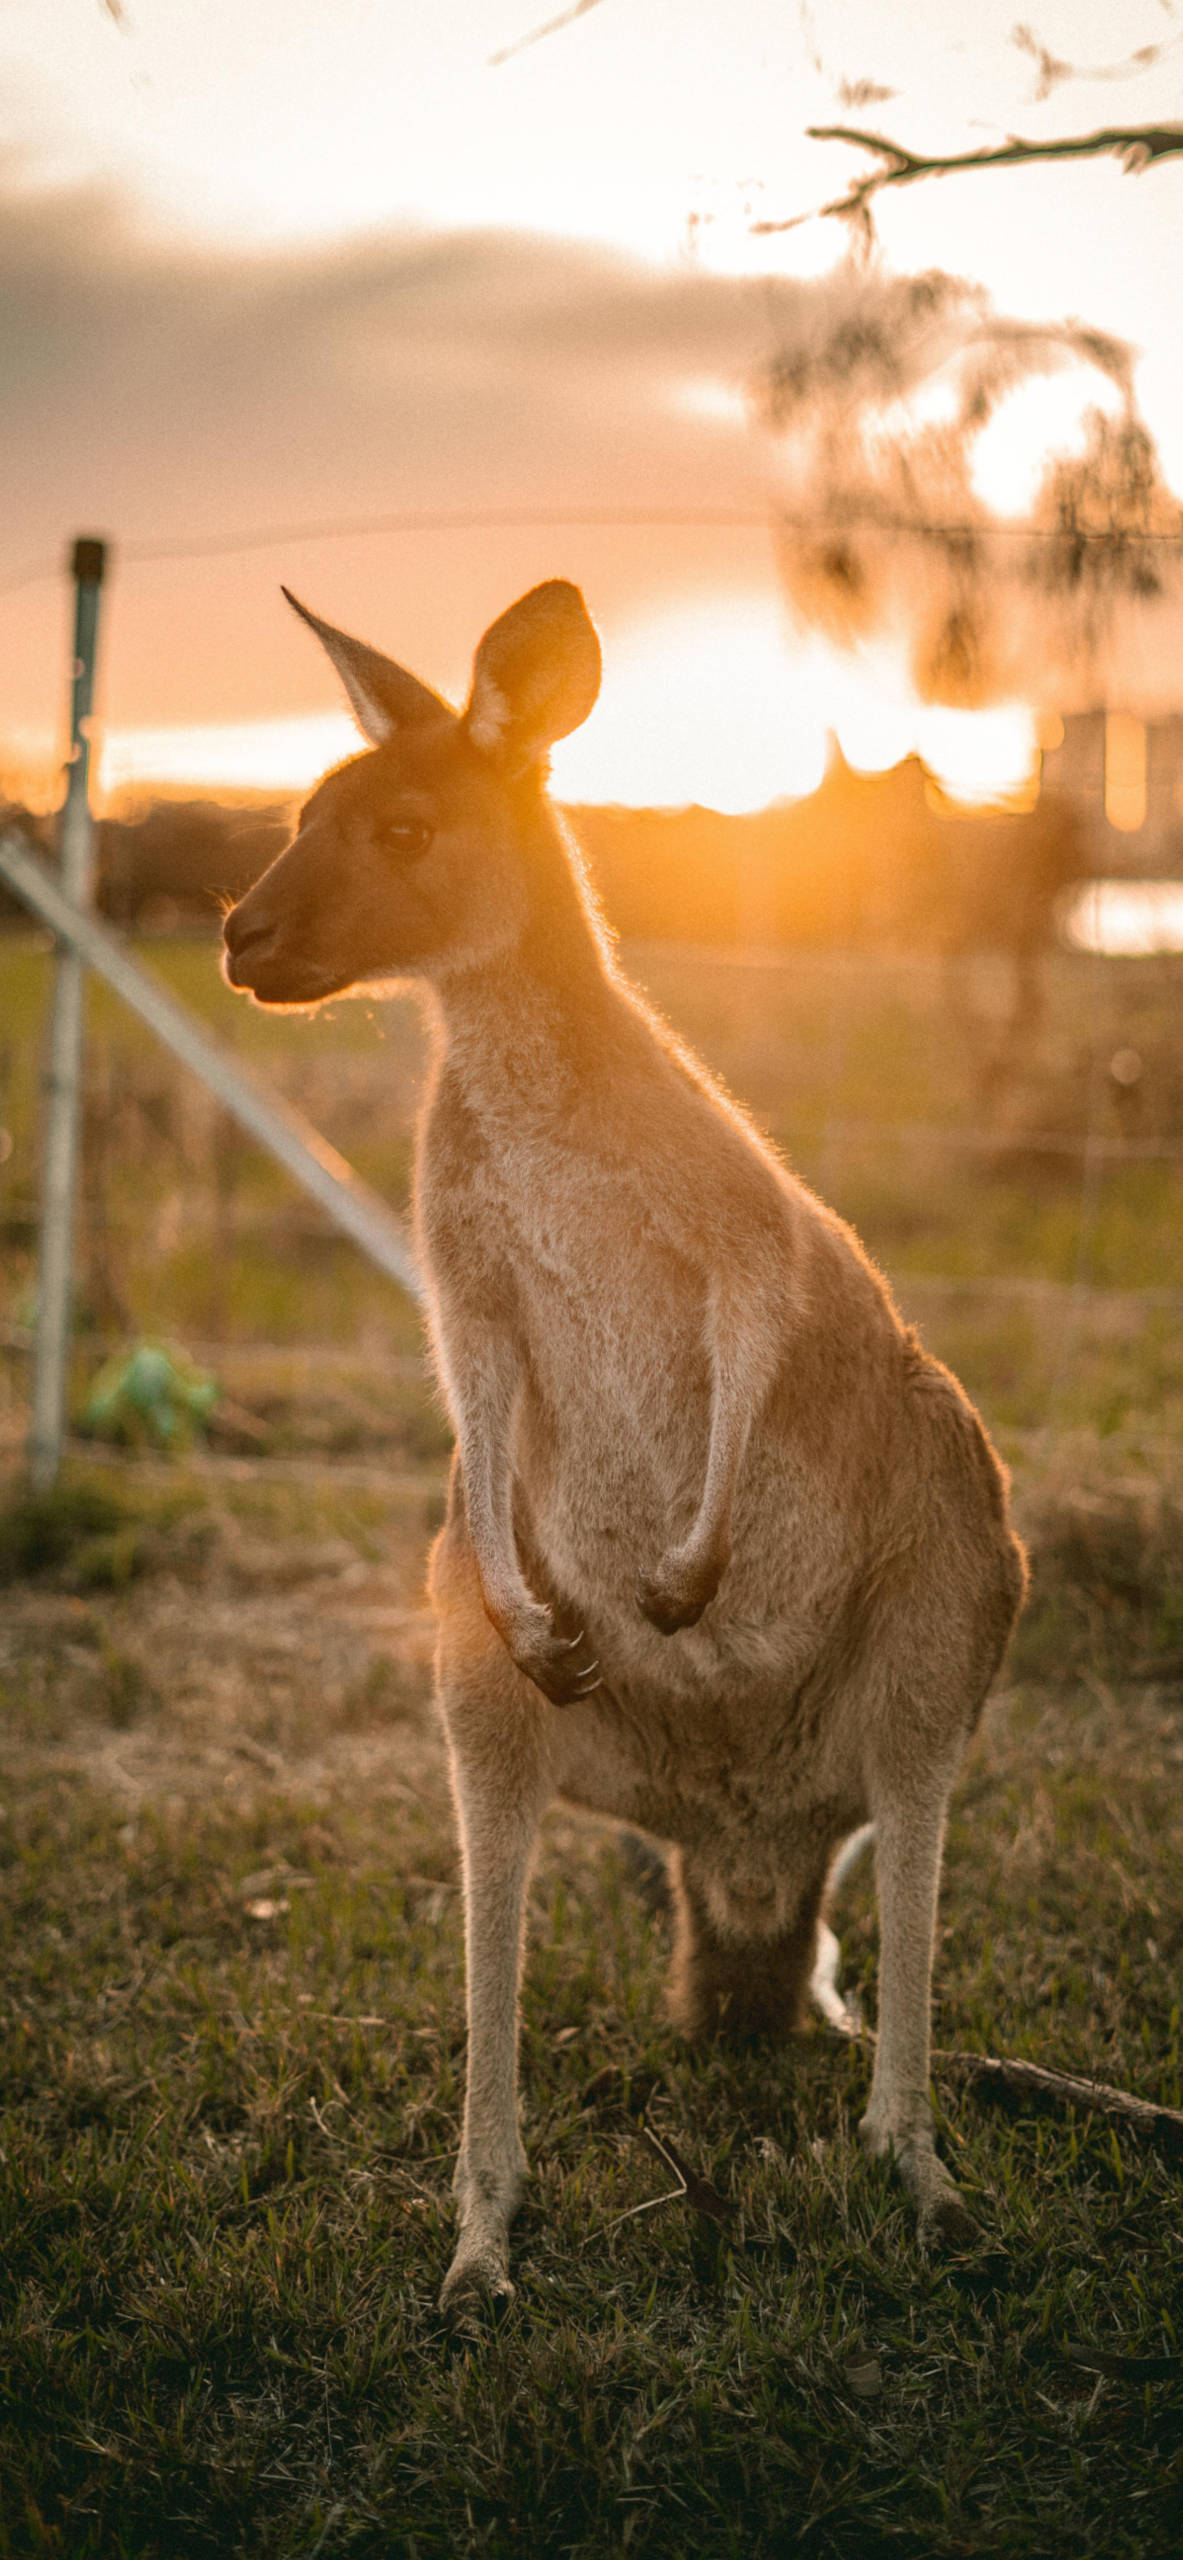 iPhone wallpapers kangaroo looking right sunset Kangaroo